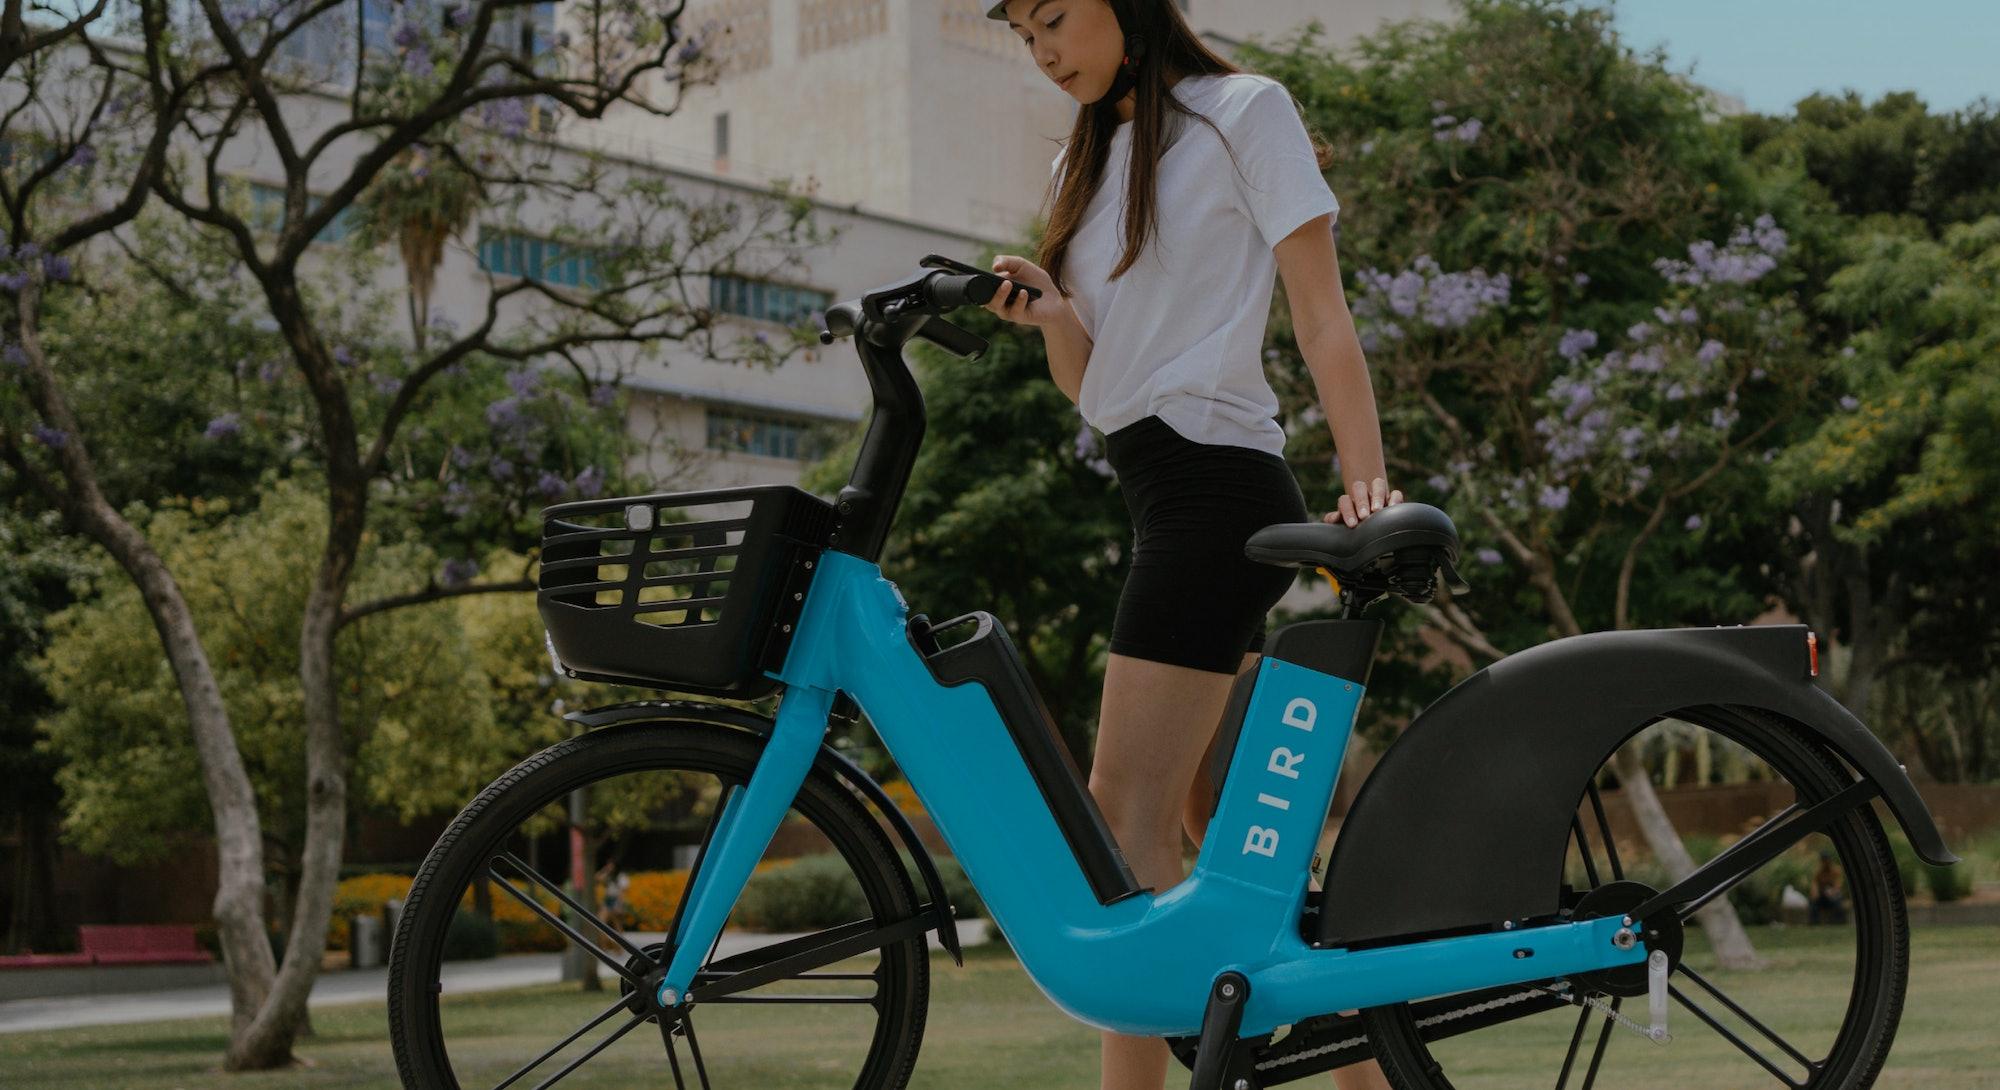 Bird has announced Bird Bike, its first shared electric bike.